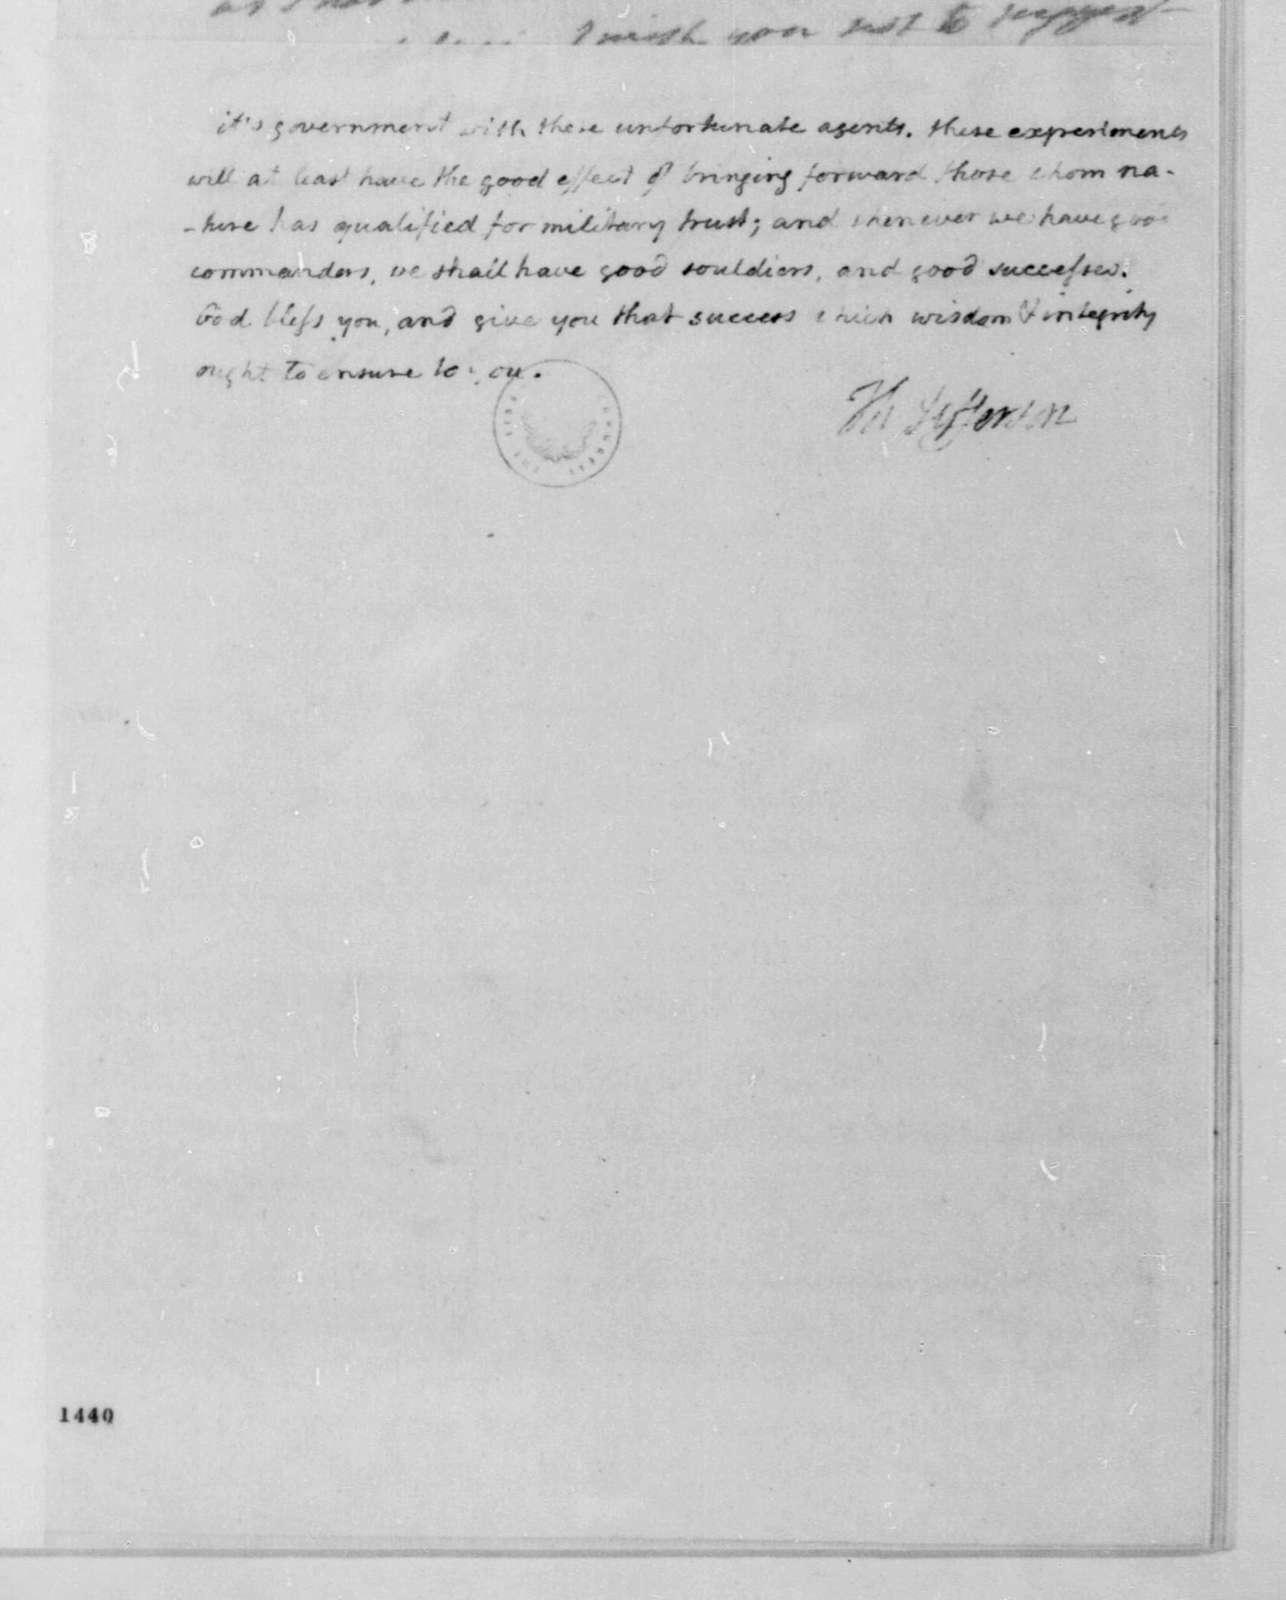 Thomas Jefferson to James Madison, February 21, 1813.